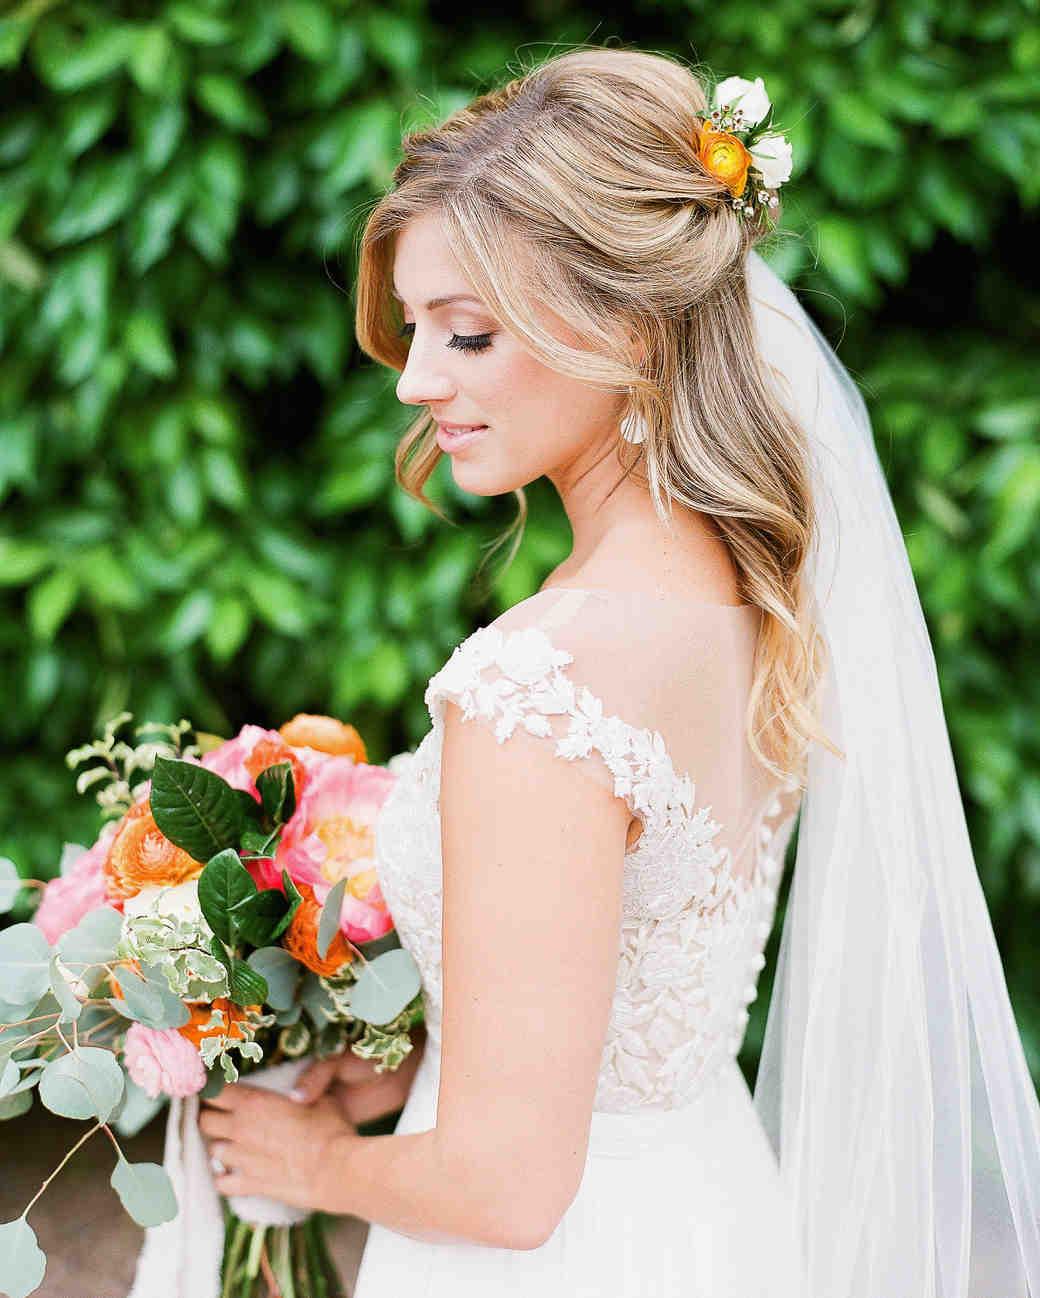 28 HalfUp HalfDown Wedding Hairstyles We Love  Martha